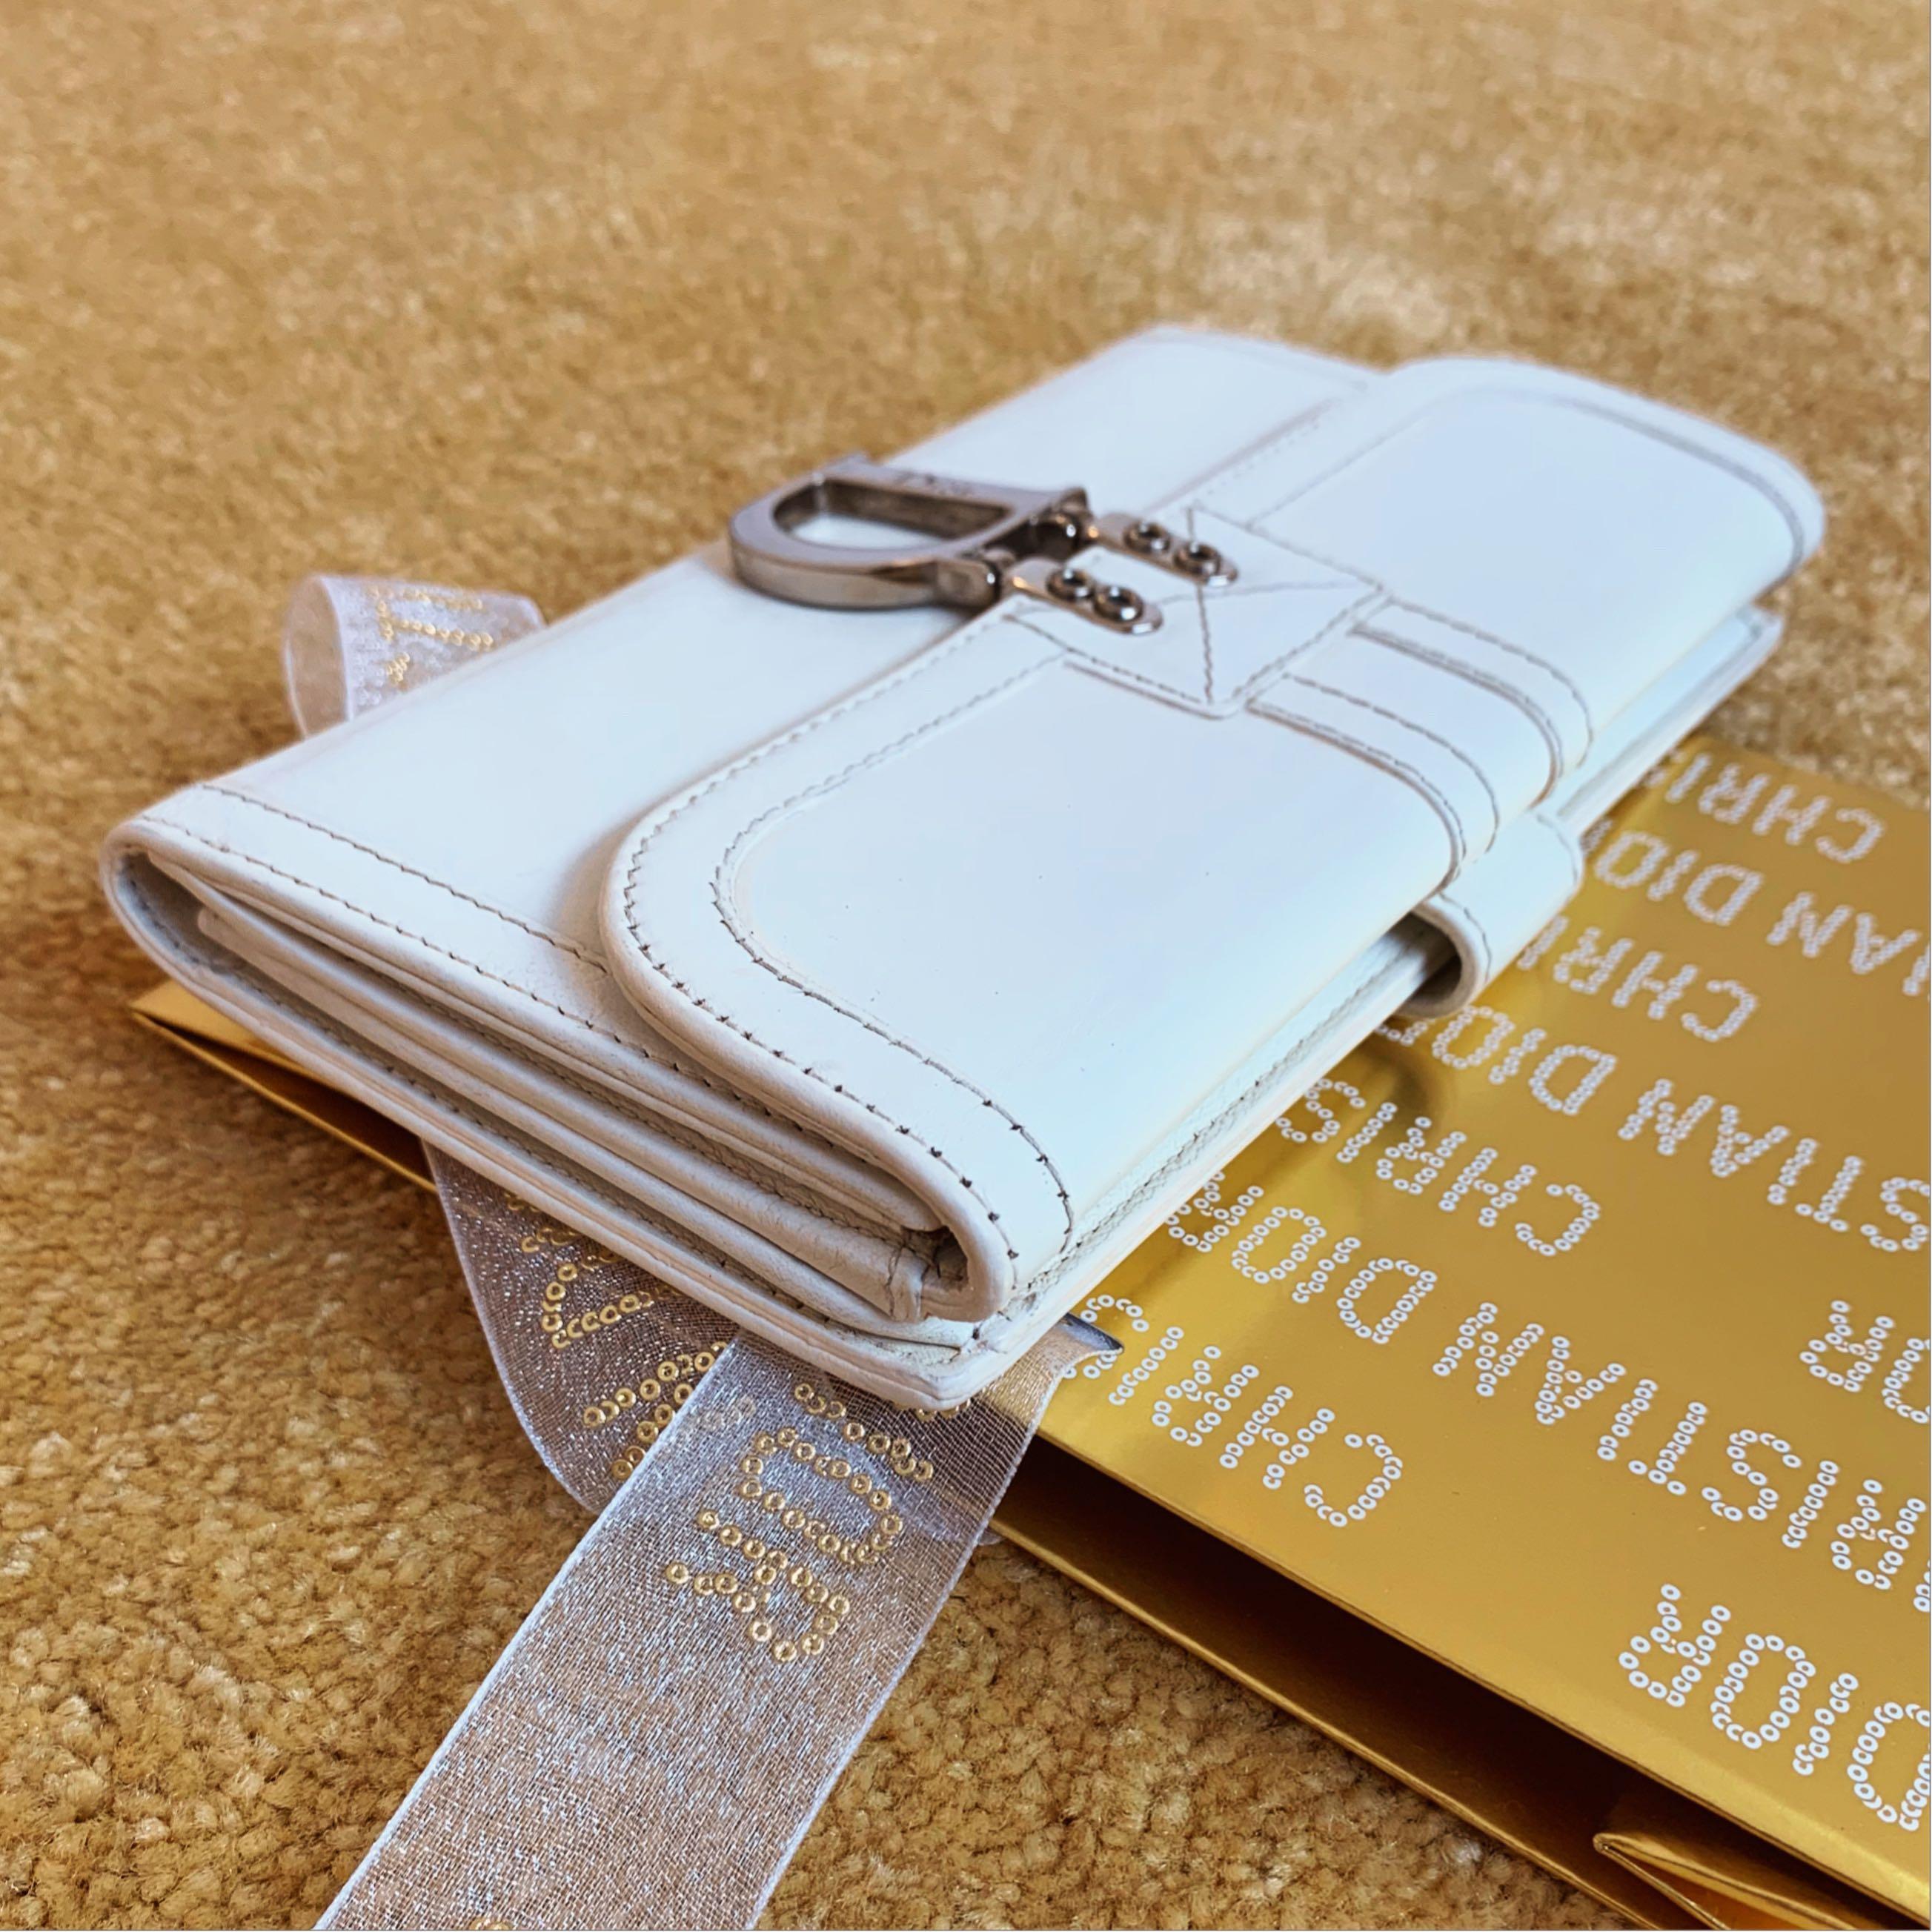 preloved dompet authentic christian dior second bekas original unisex long wallet